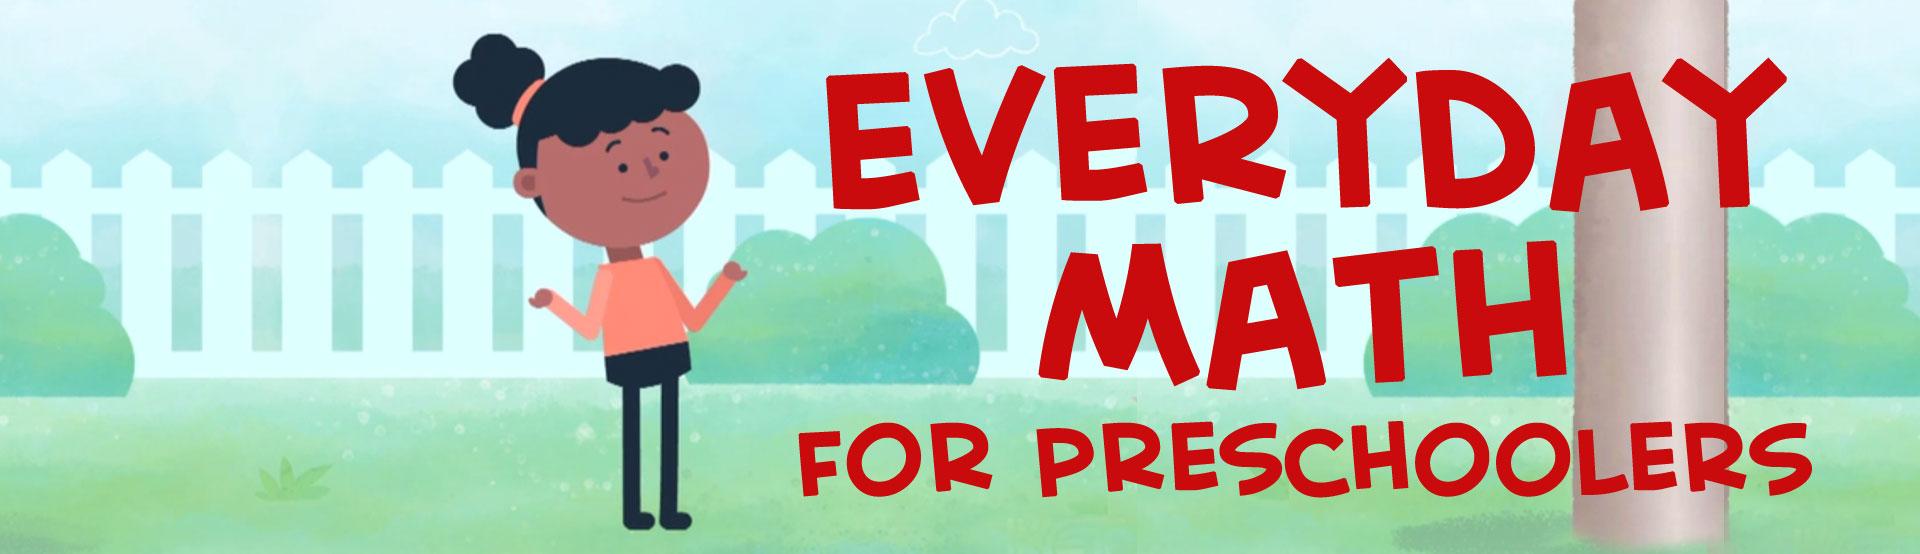 Everyday Math for Preschoolers